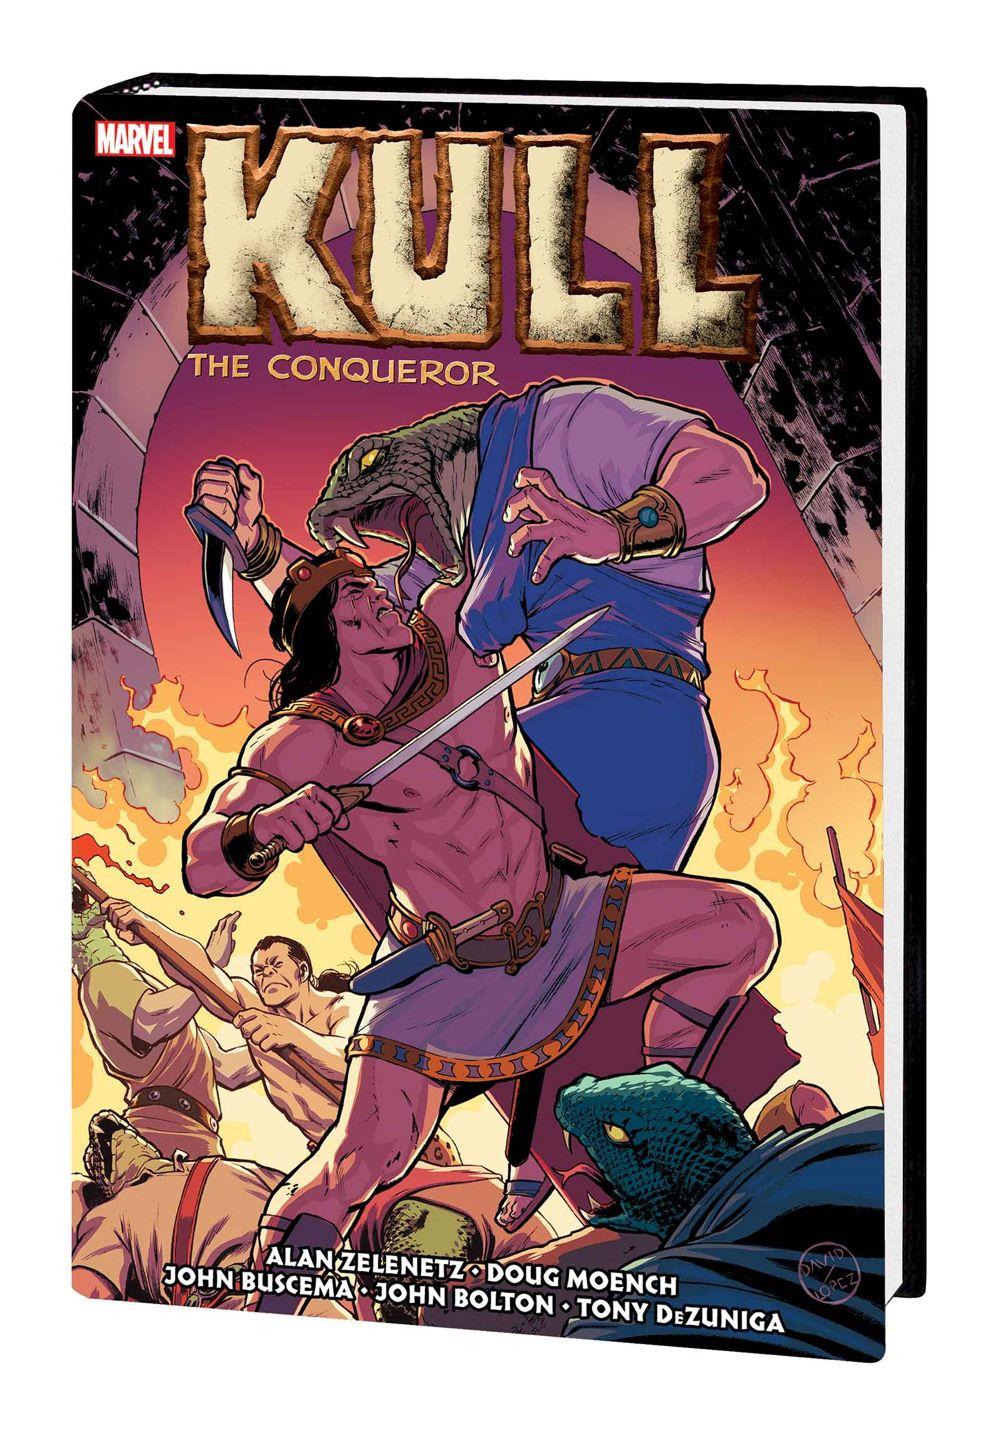 KULLCONMAROMNIHC_LOPEZ_HC Marvel Comics June 2021 Solicitations